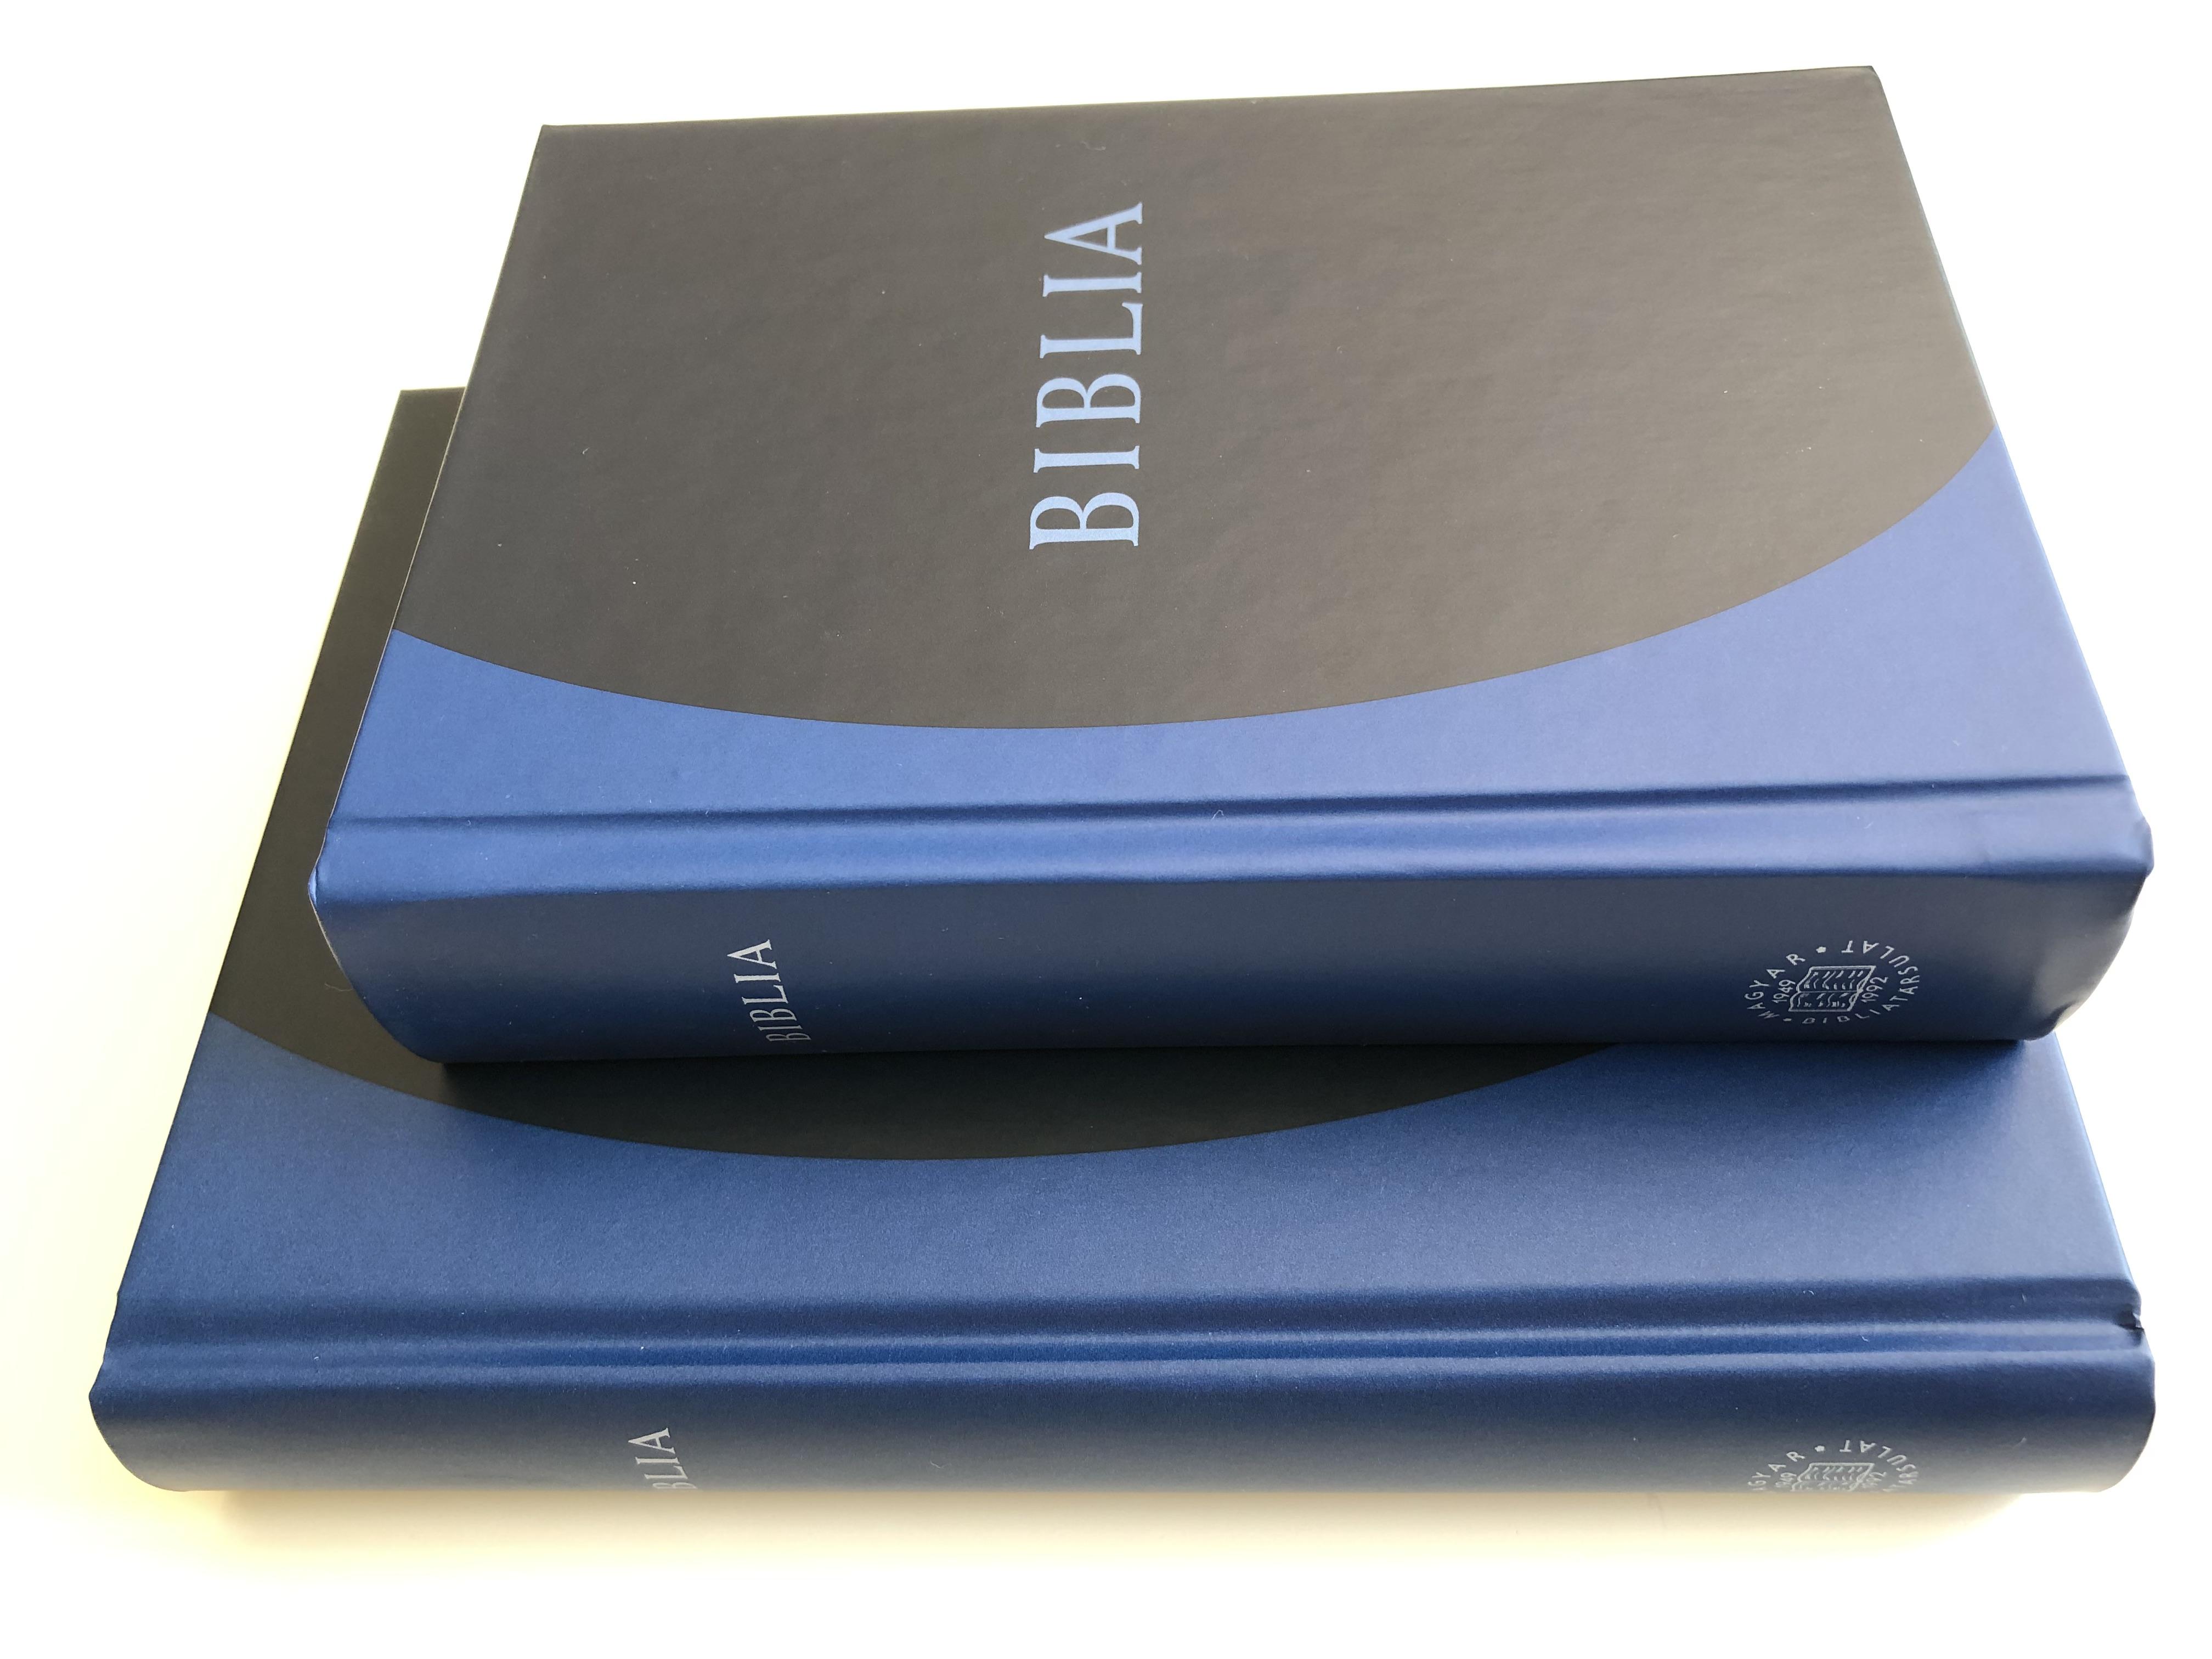 biblia-istennek-az-sz-vets-gben-s-jsz-vets-gben-adott-kijelent-se-r-f-2014-comparison-2-.jpg